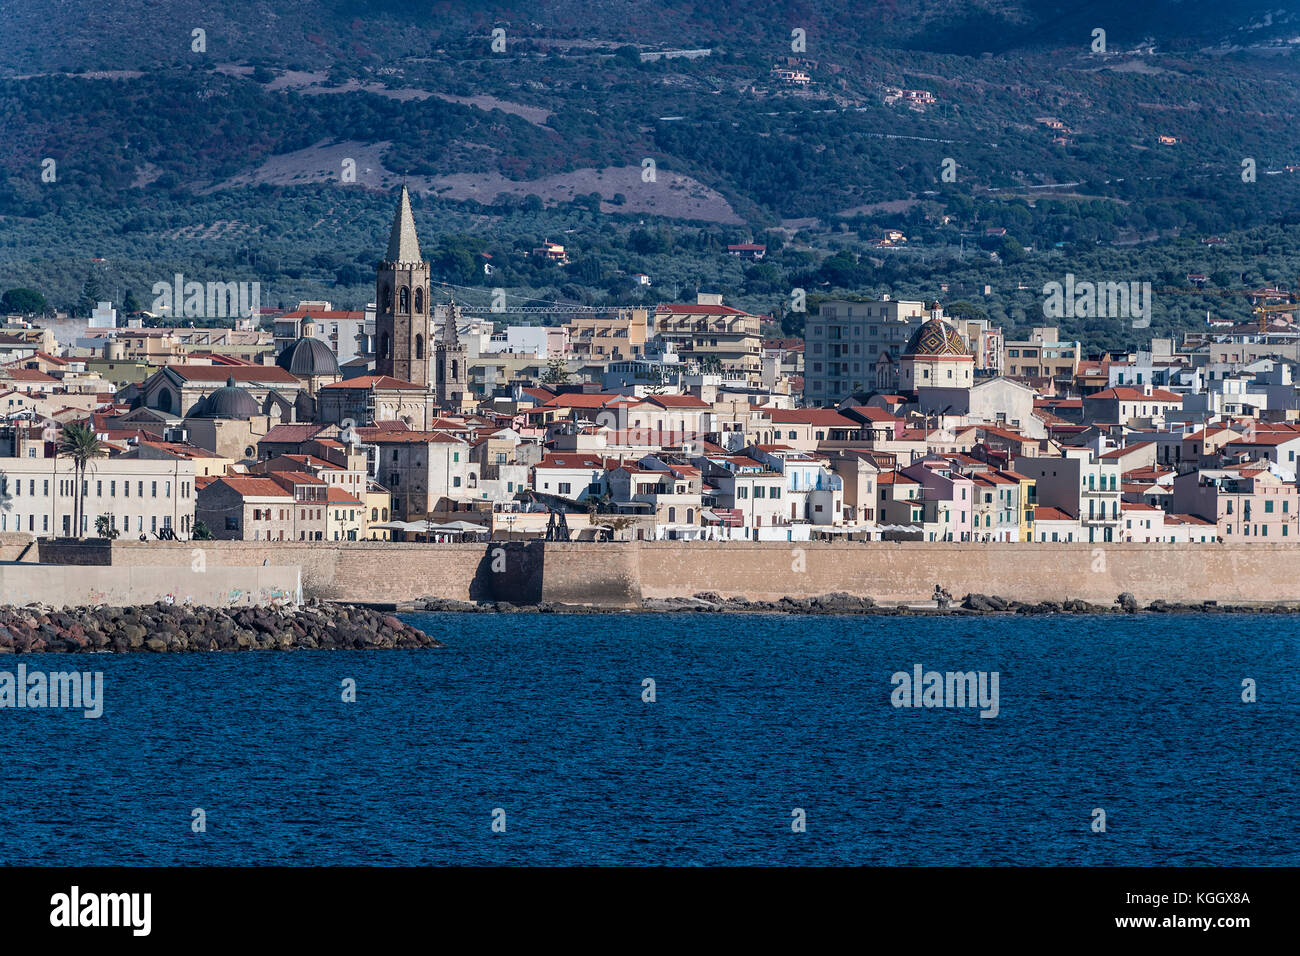 Stadtbild von Alghero, Sardinien, Italien Stockbild